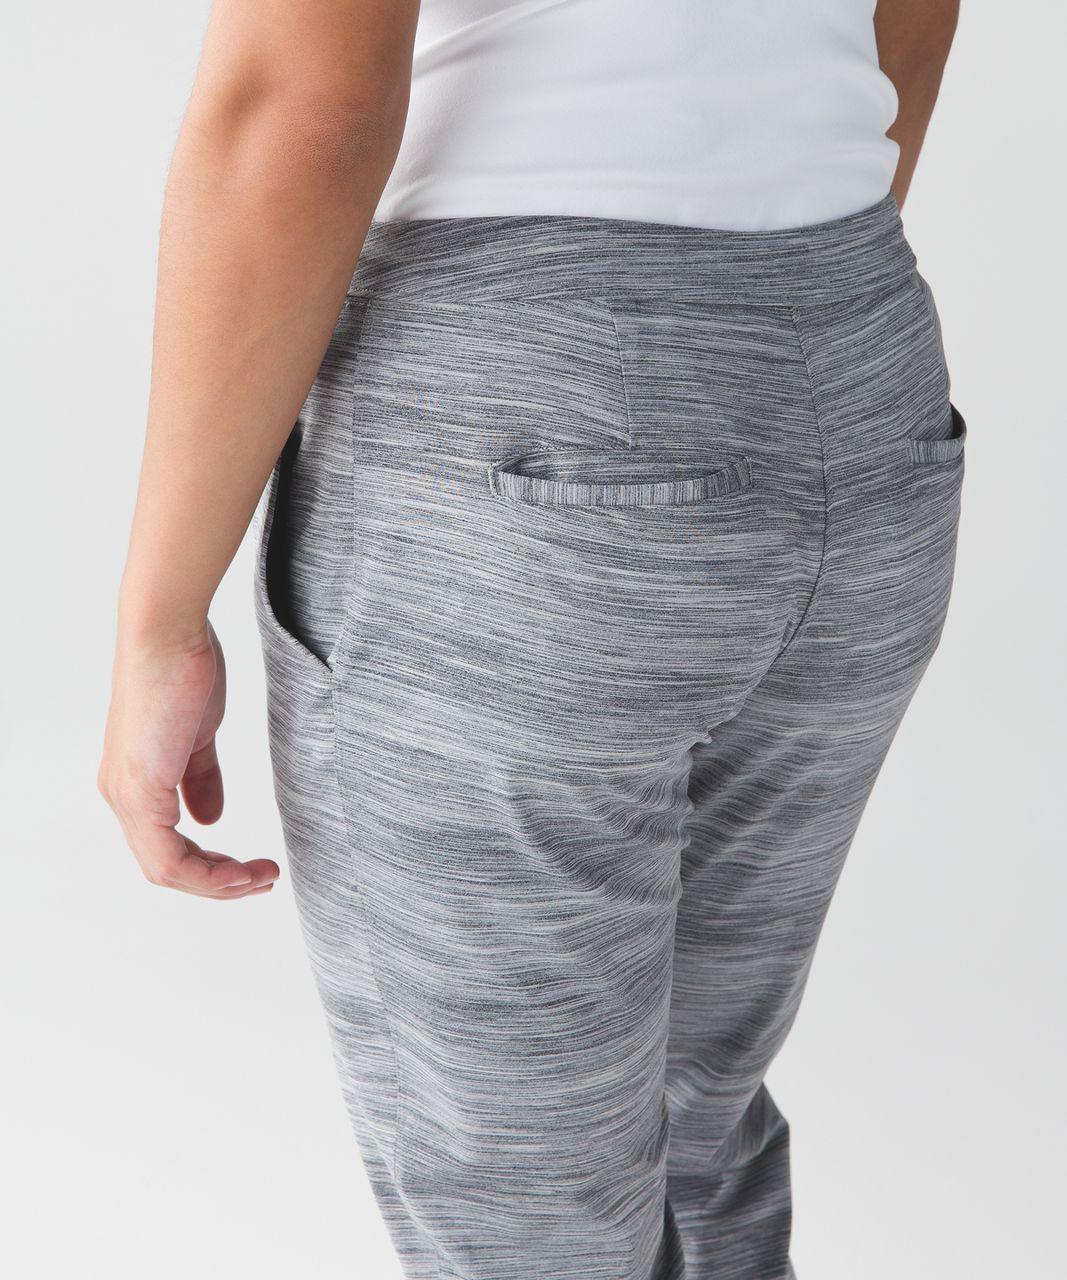 Lululemon Jet Crop (Slim) - Space Dye Camo Seal Grey Deep Coal